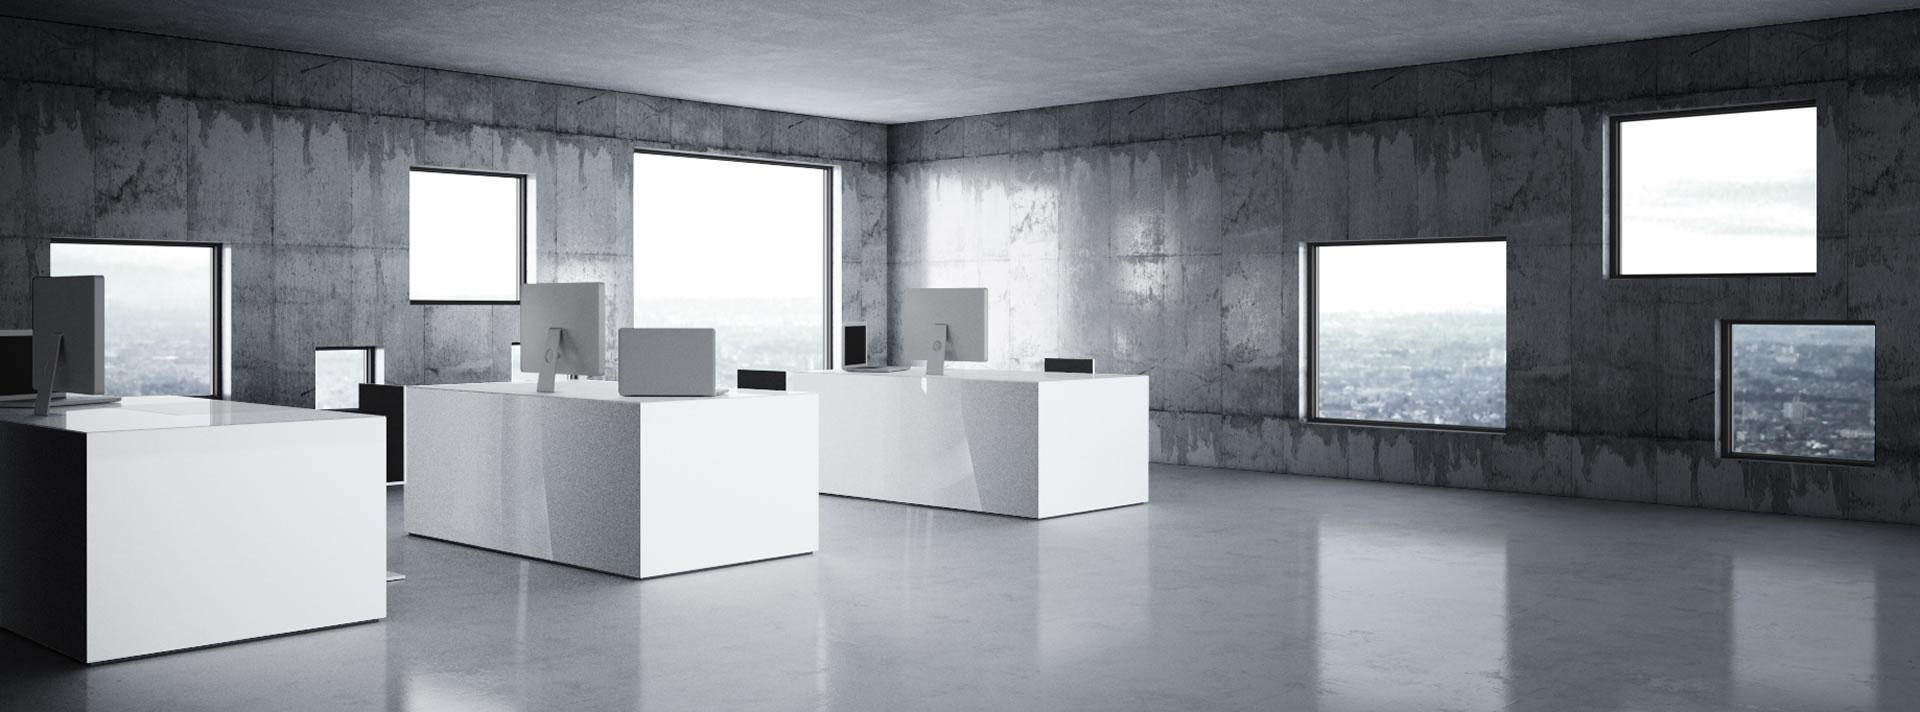 Büromöbel - Design - RECHTECK